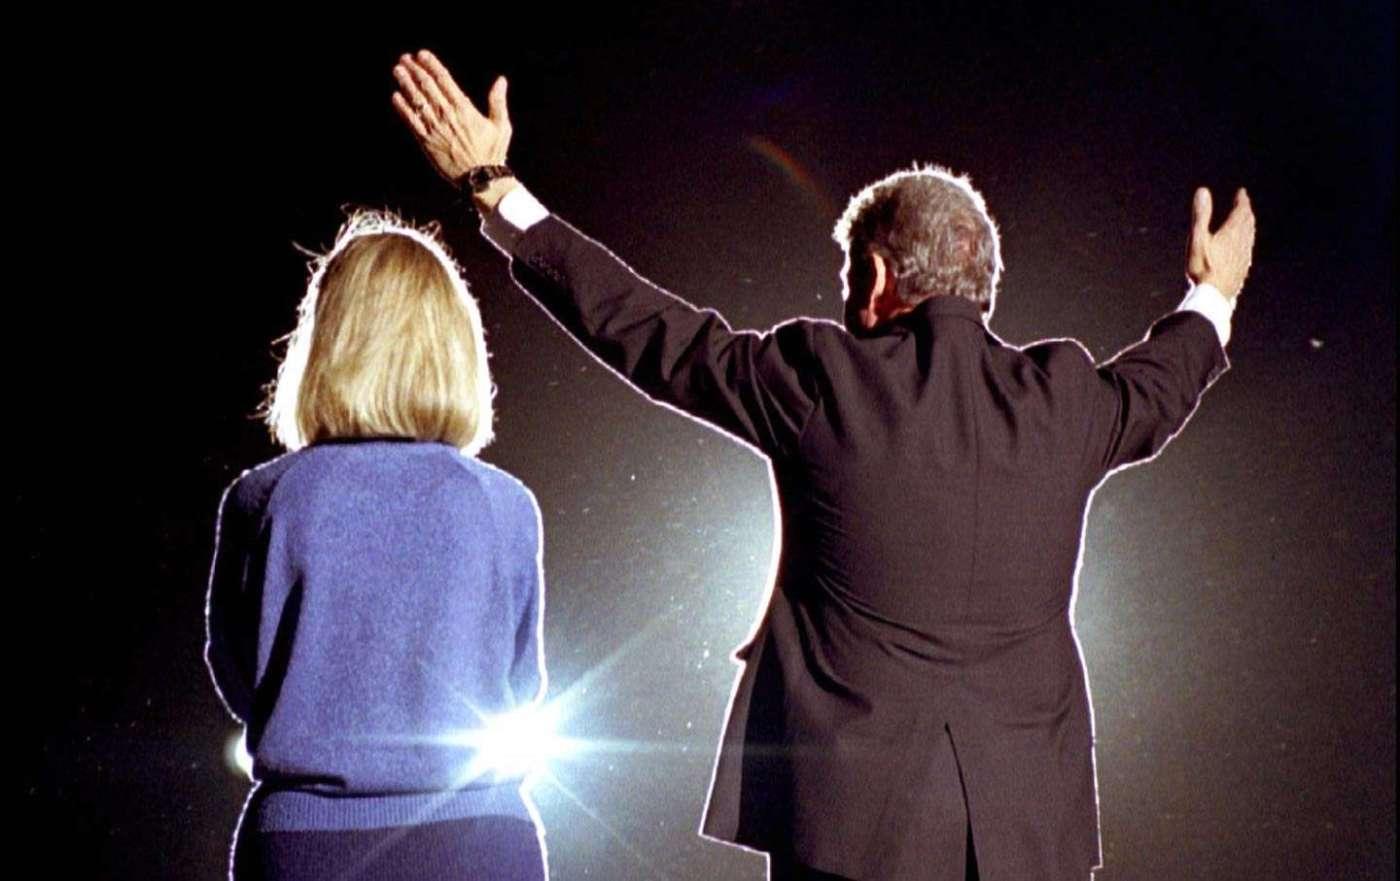 hillary_and_bill_clinton_1992_rtr_img.jpg